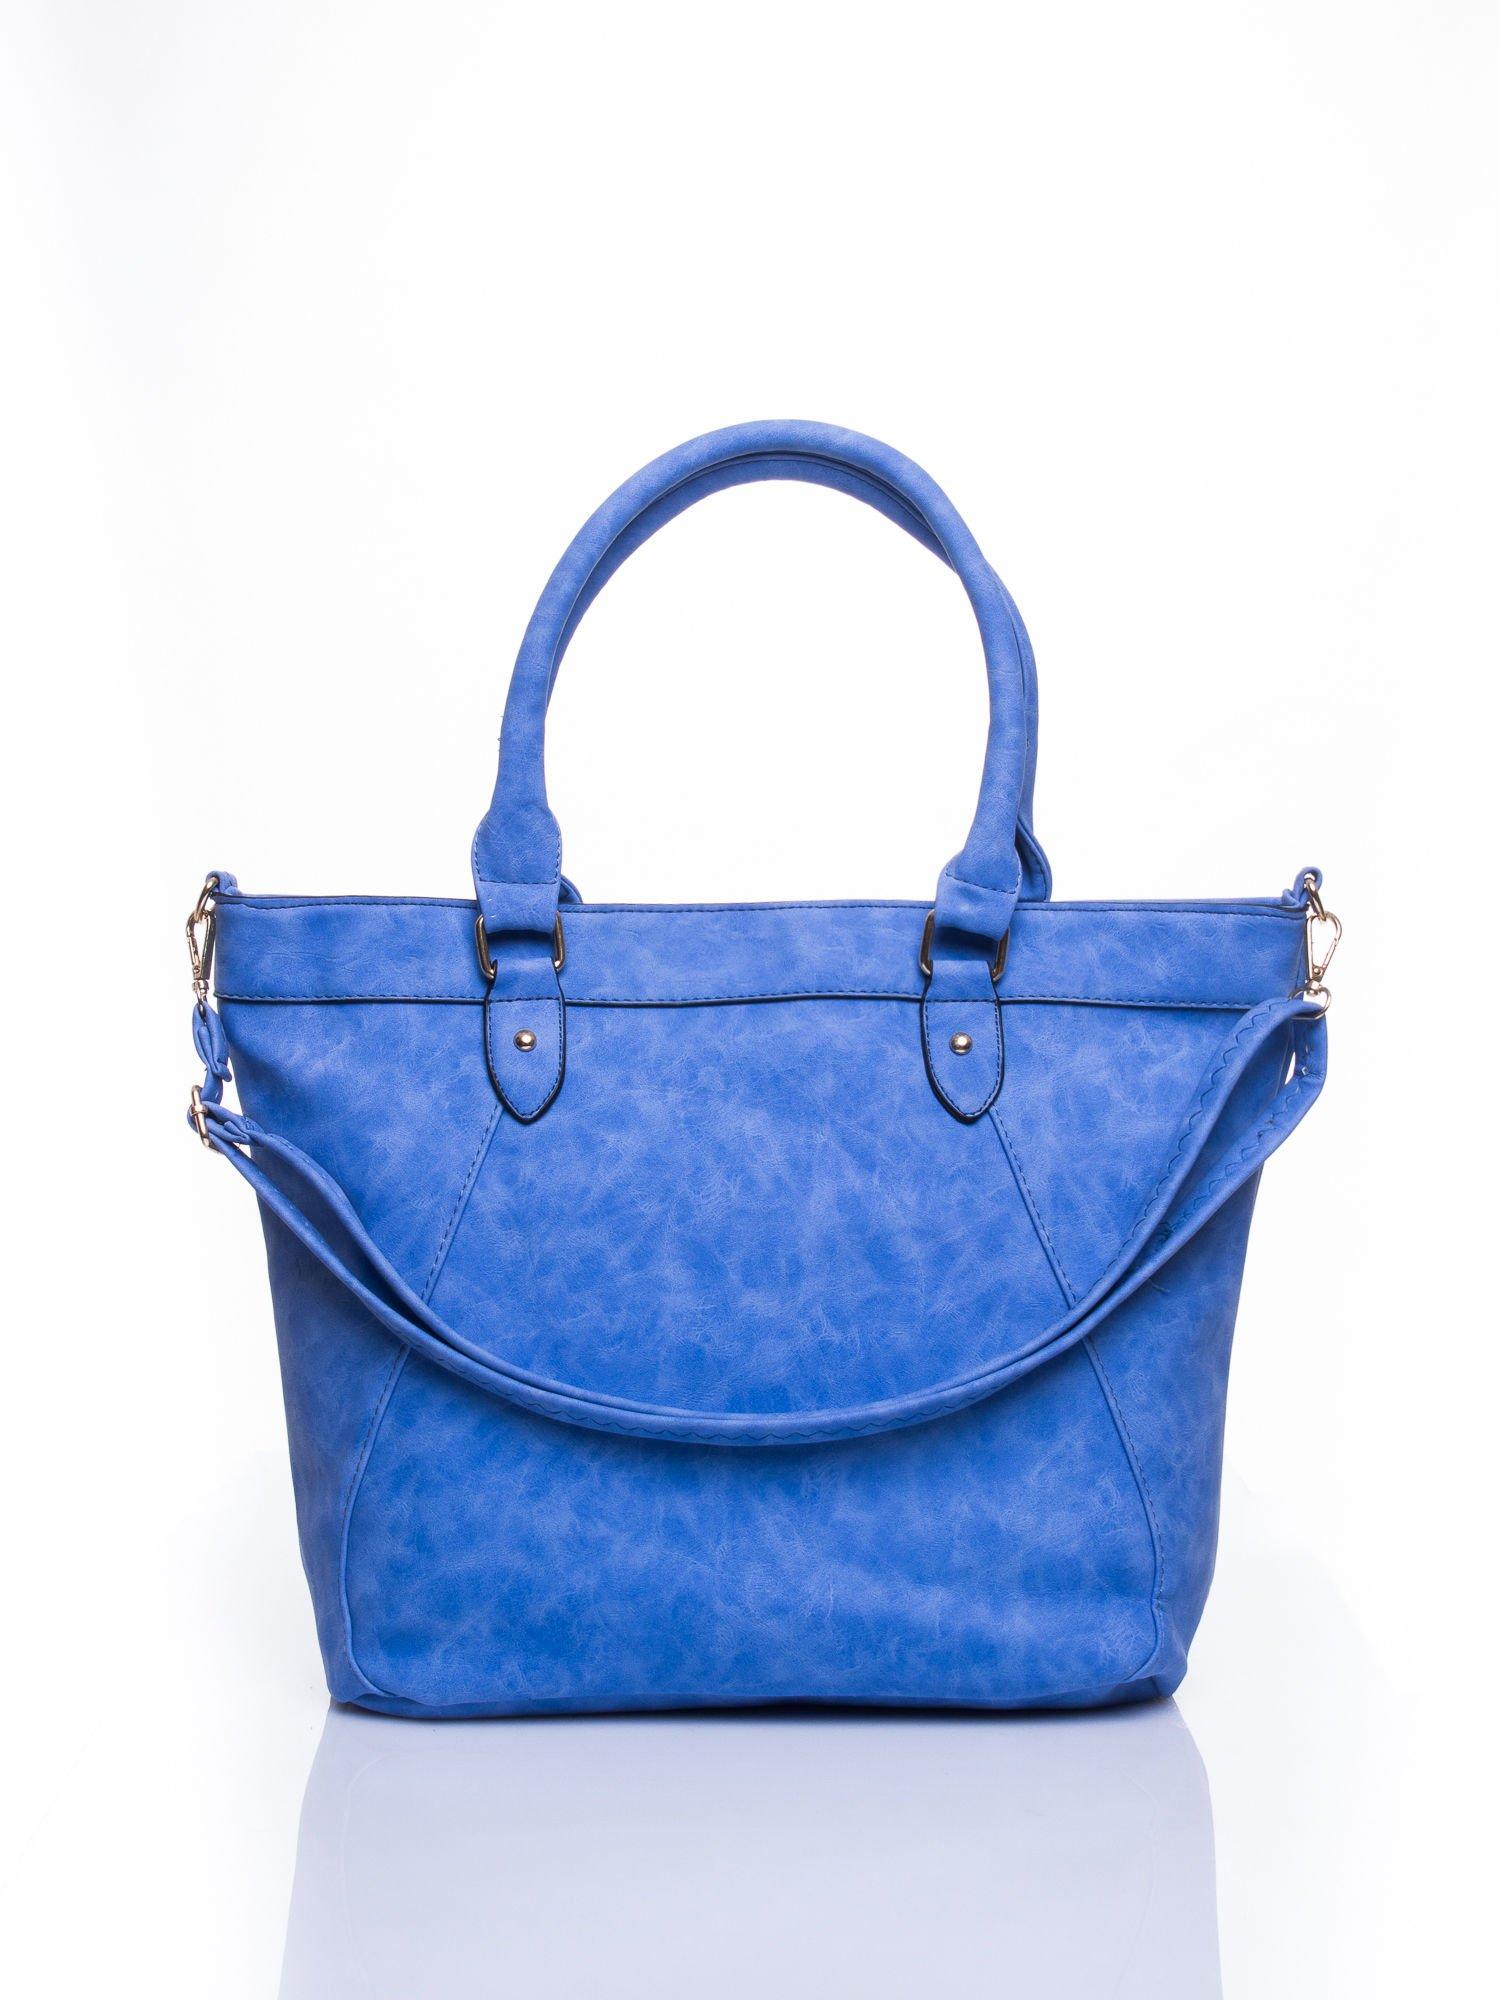 Niebieska torba city bag na ramię                                  zdj.                                  1